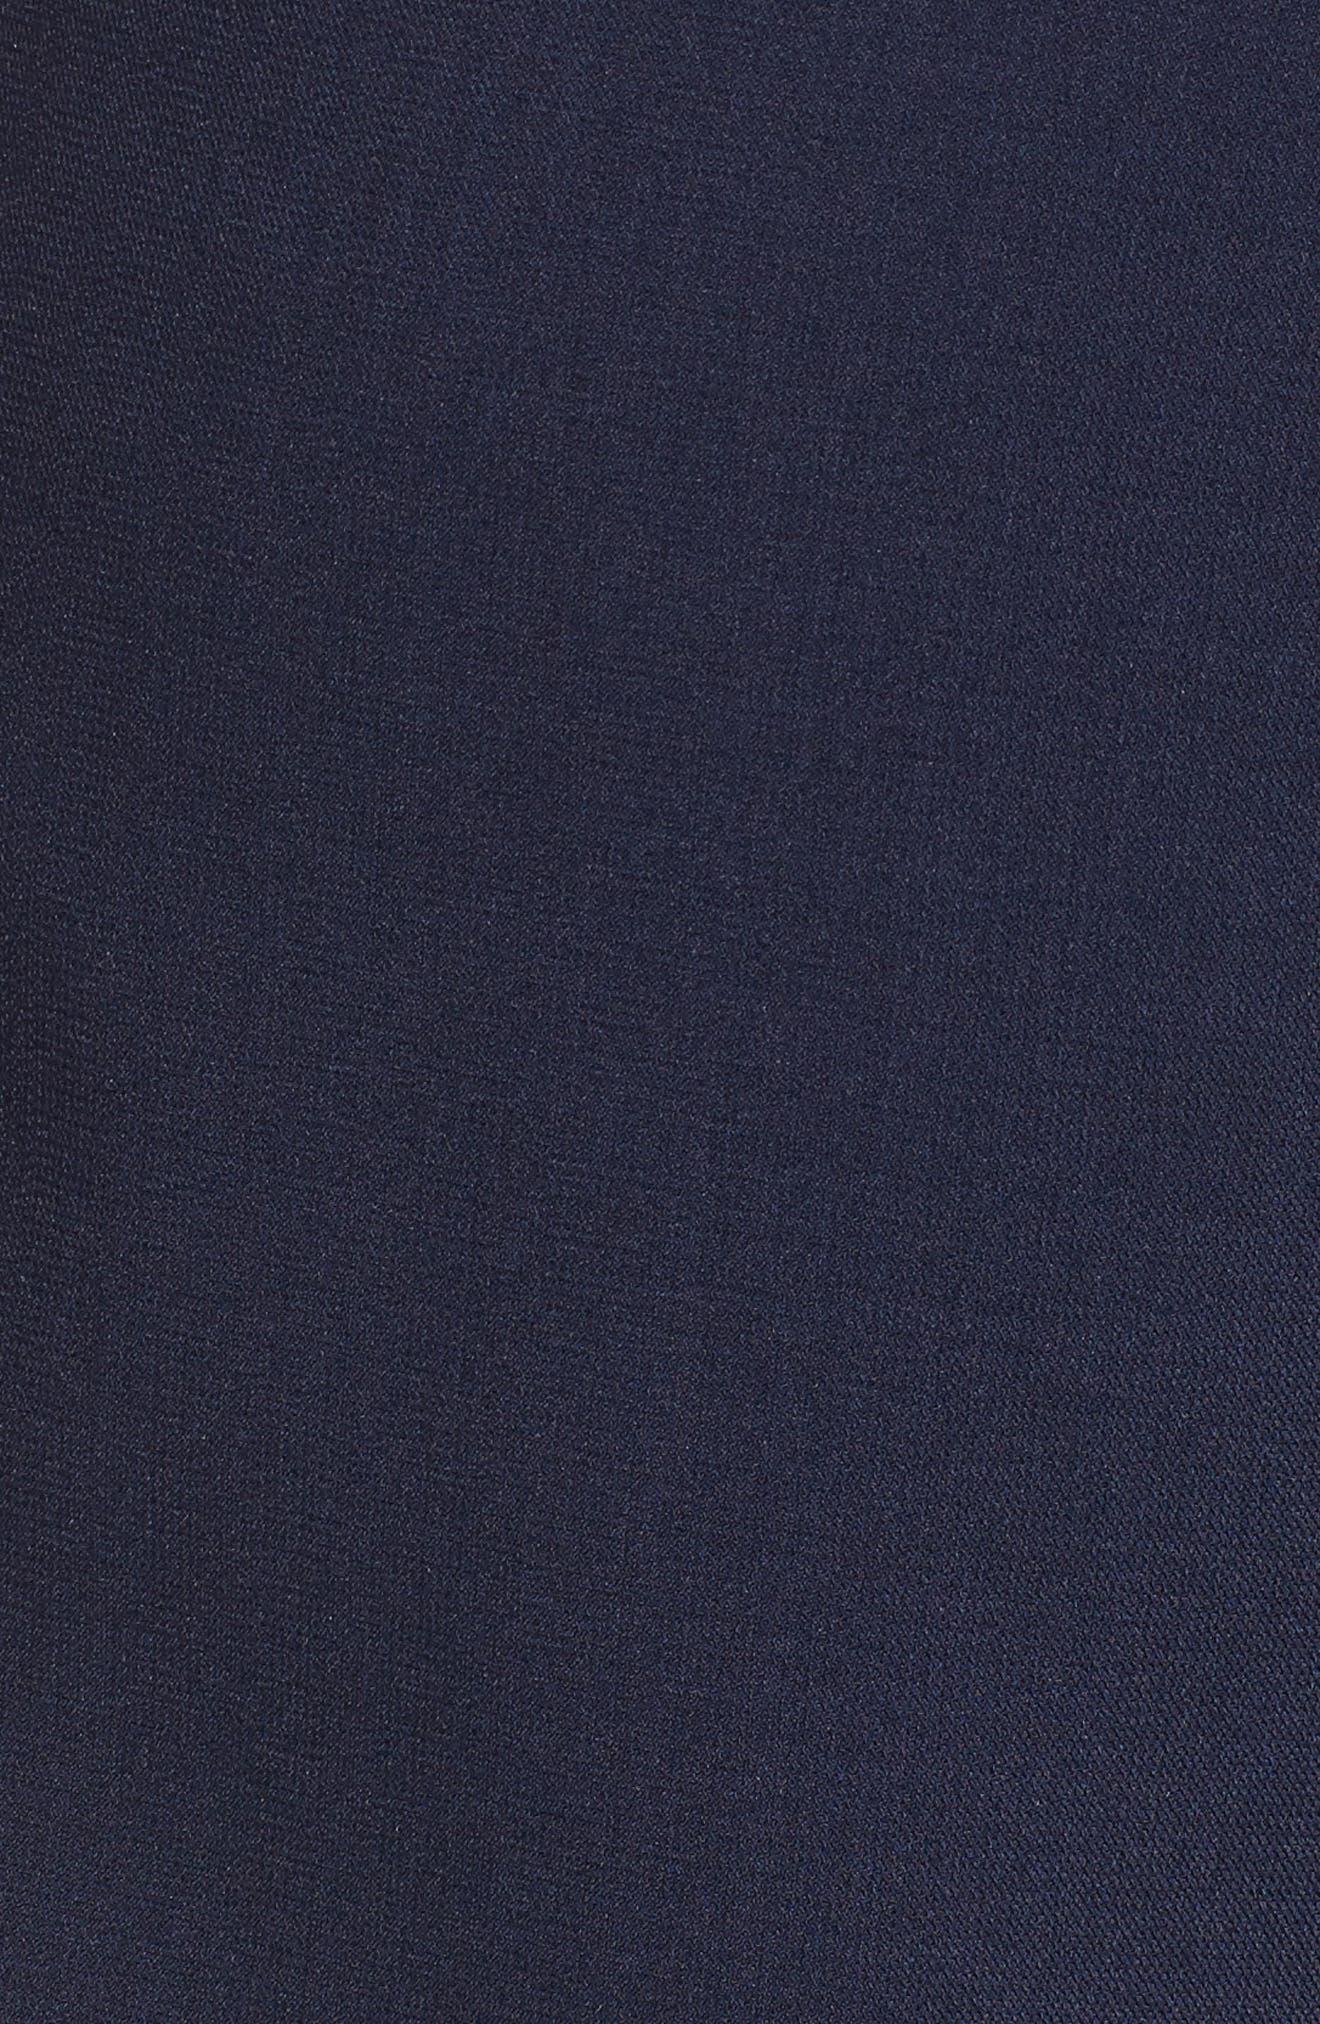 Tie Front Pants,                             Alternate thumbnail 5, color,                             Navy